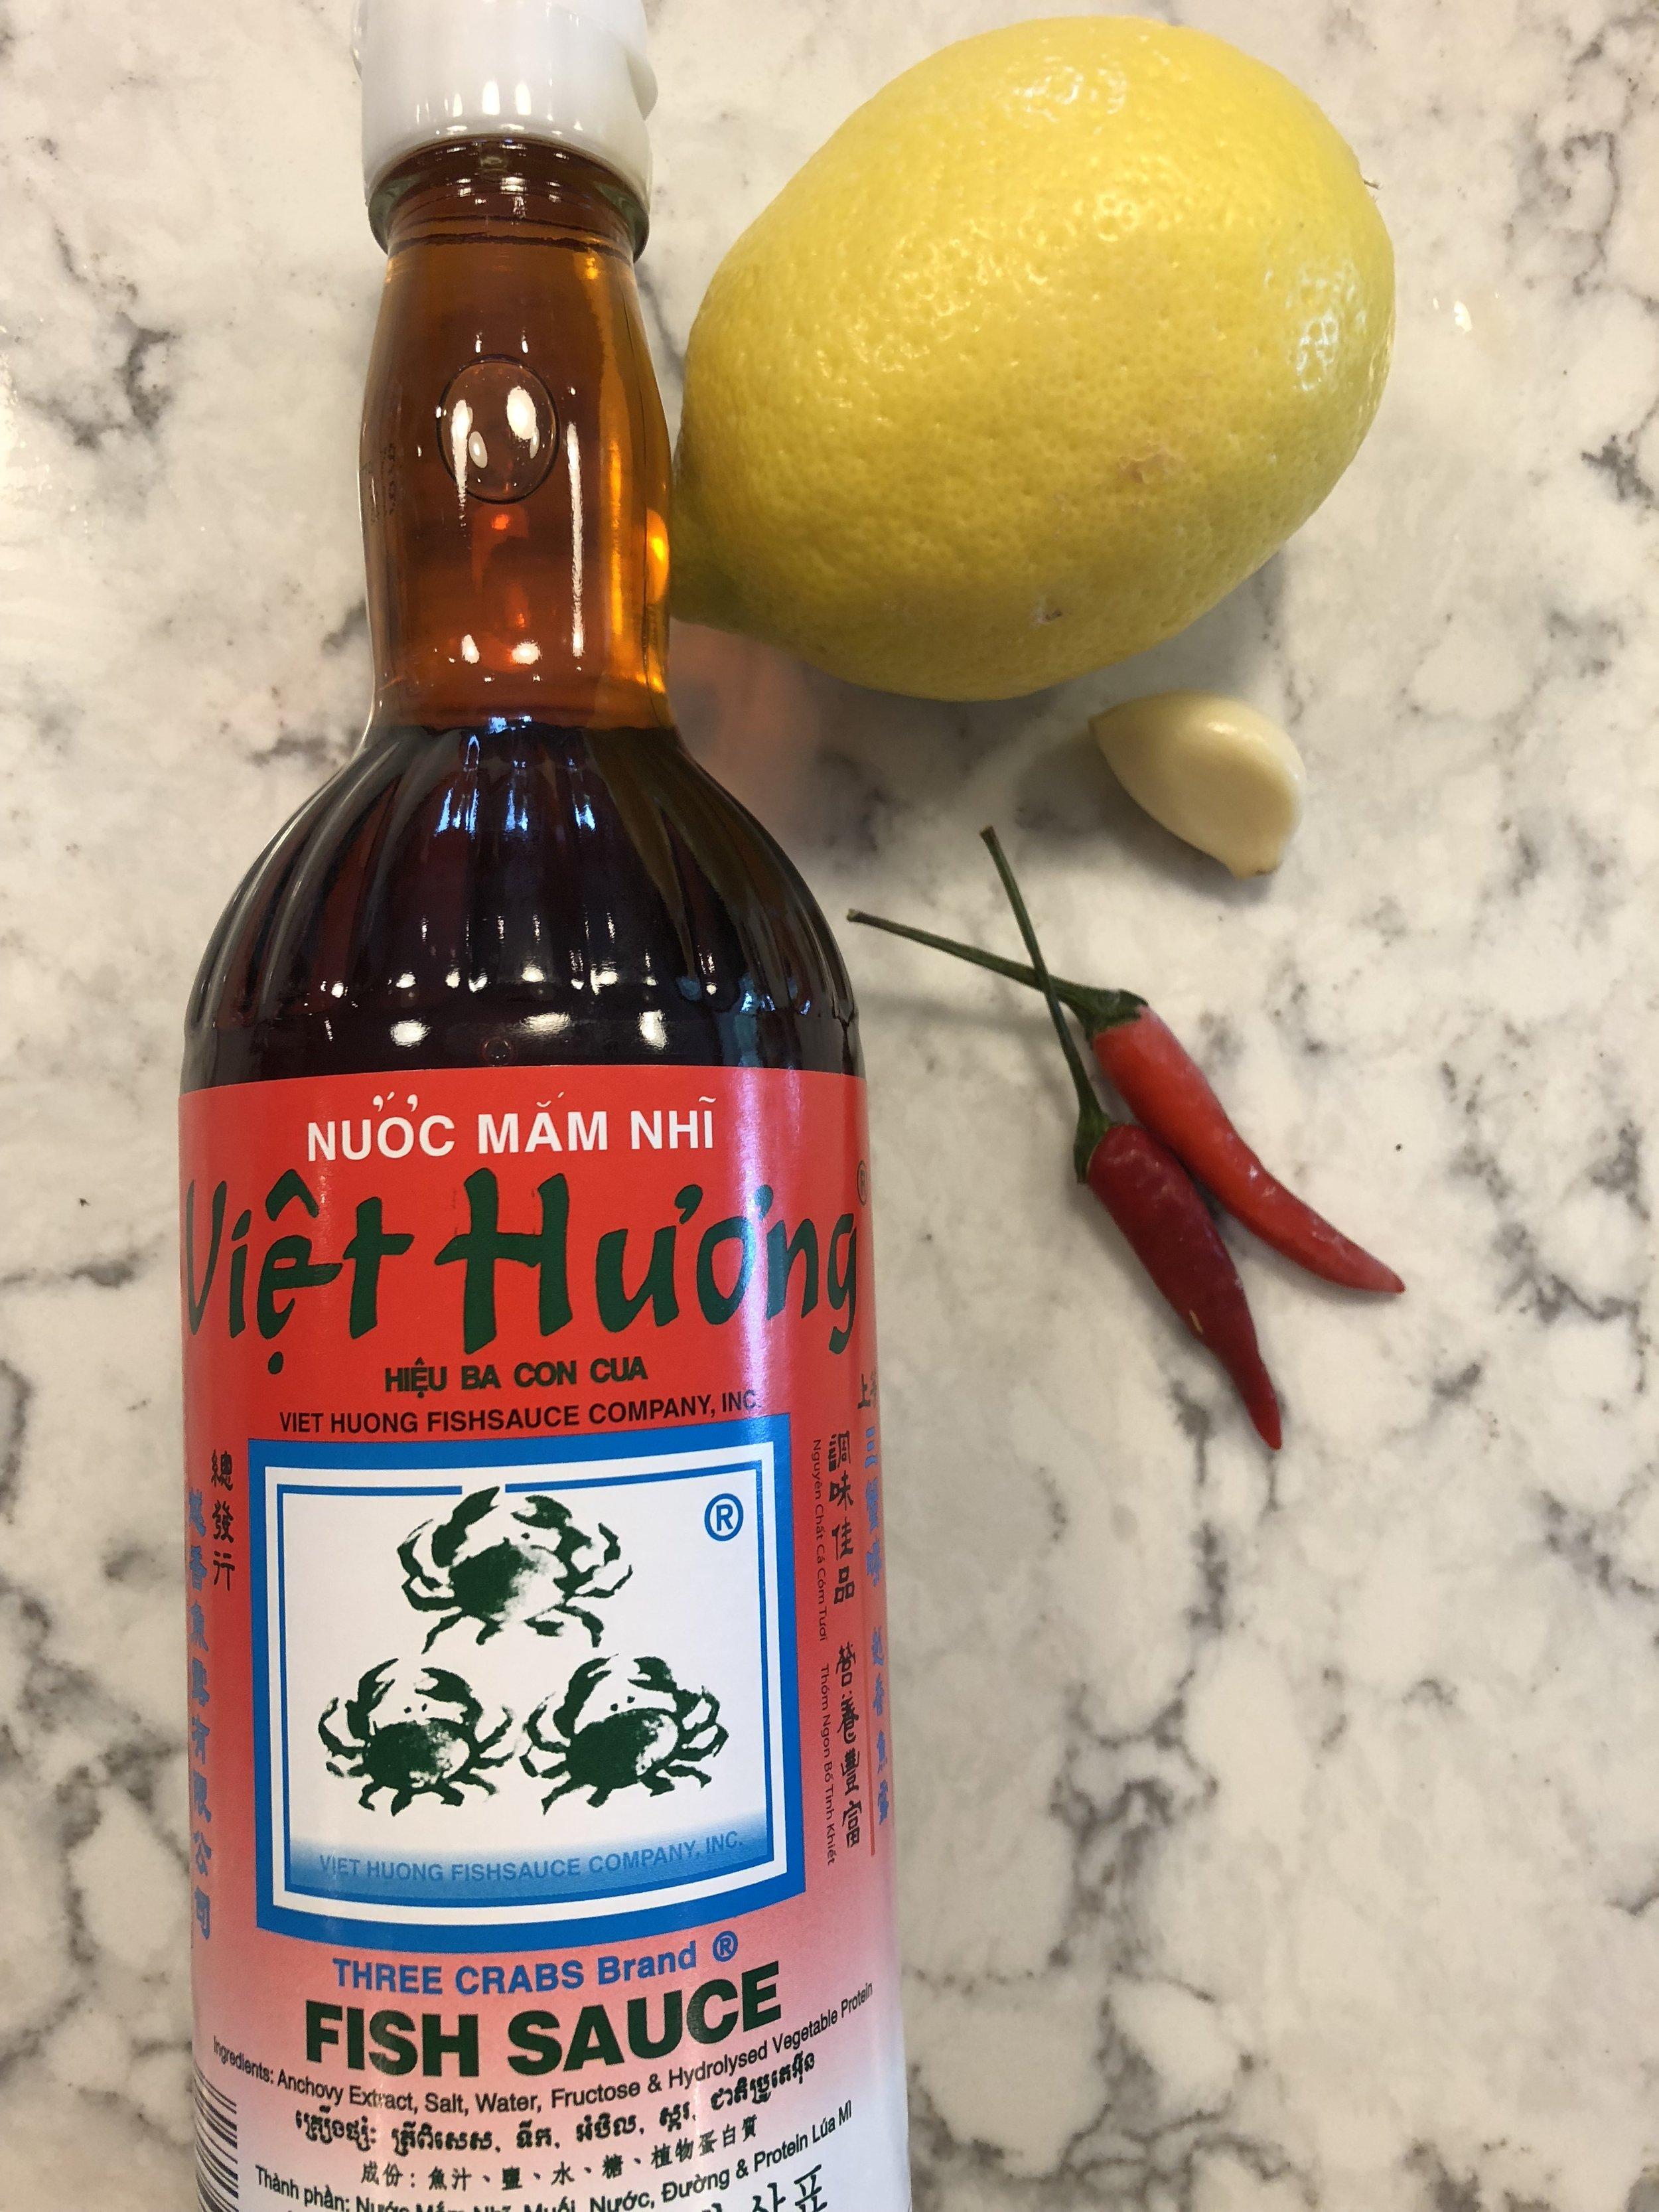 Favorite brand of fish sauce